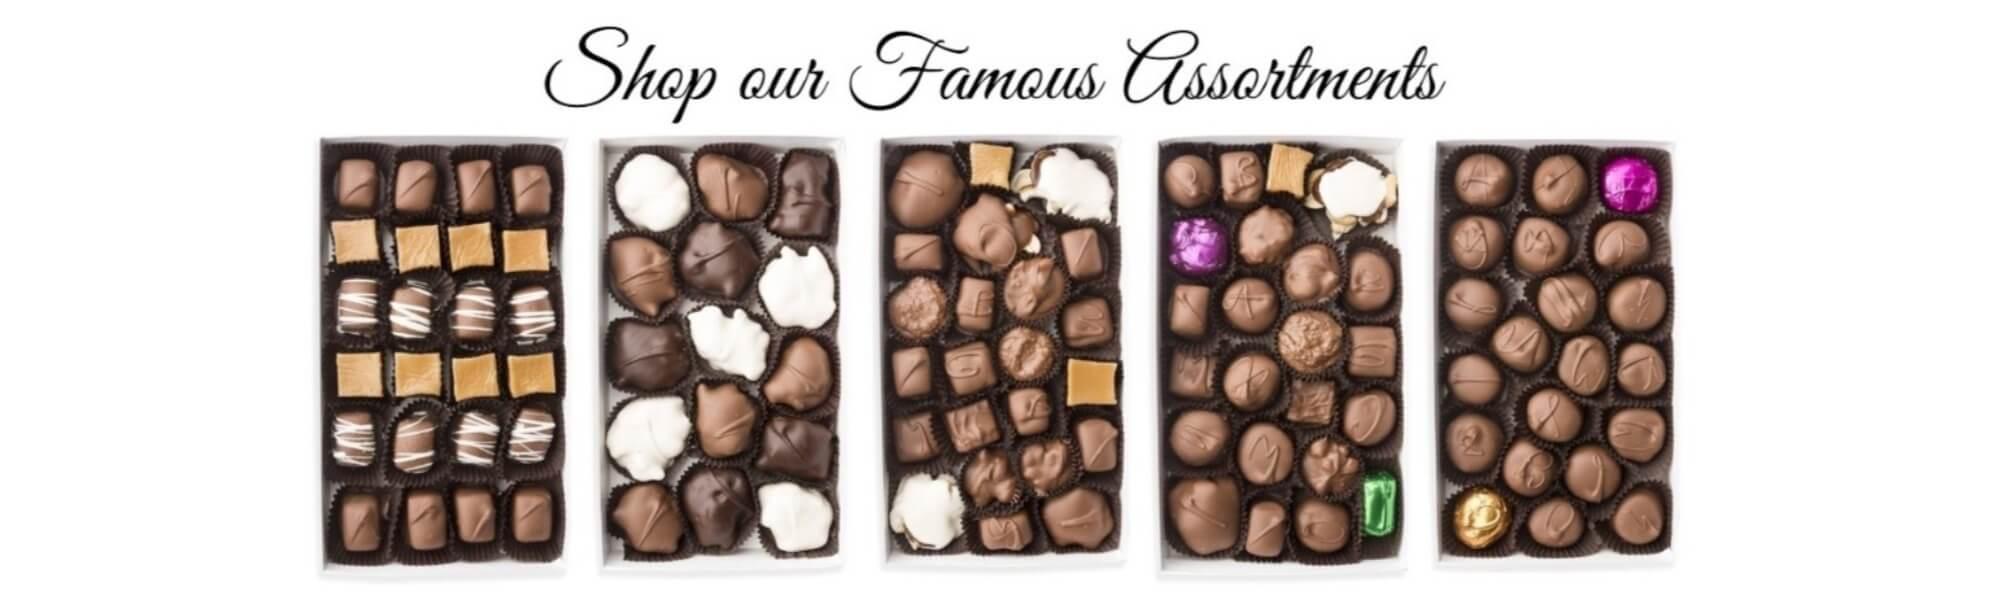 mrs cavanaugh s chocolates